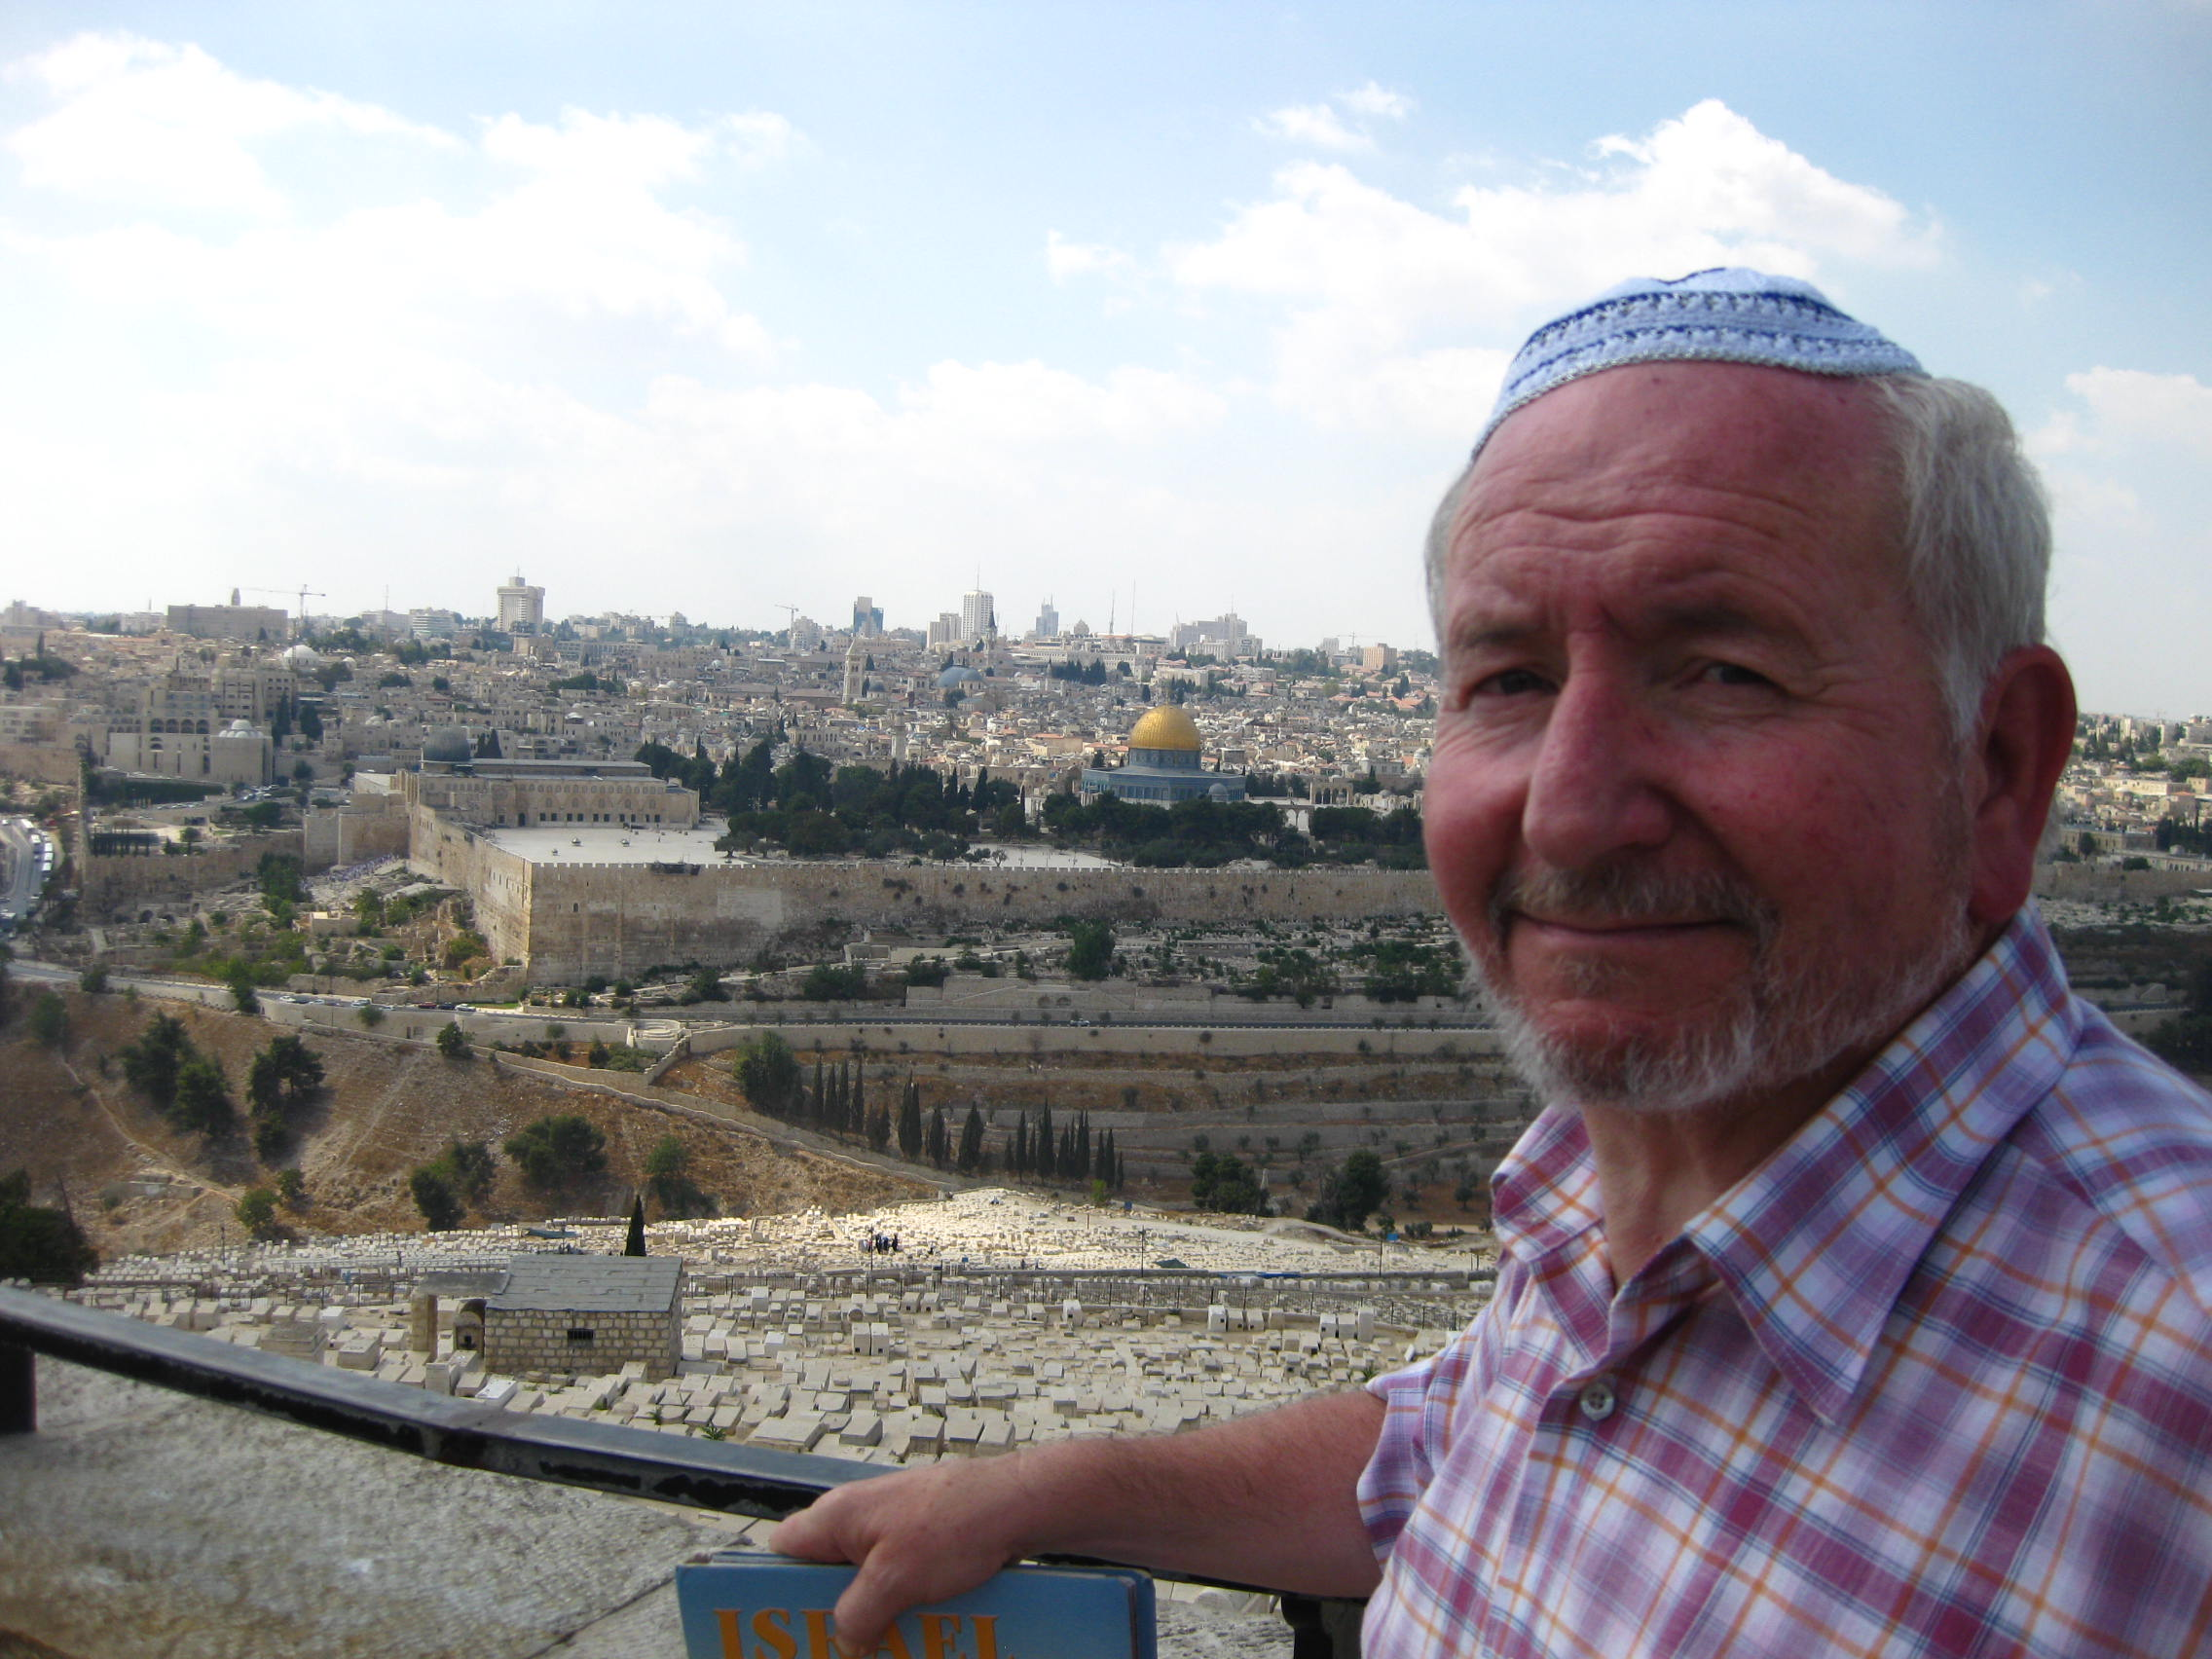 John Trew overlooks Jerusalam